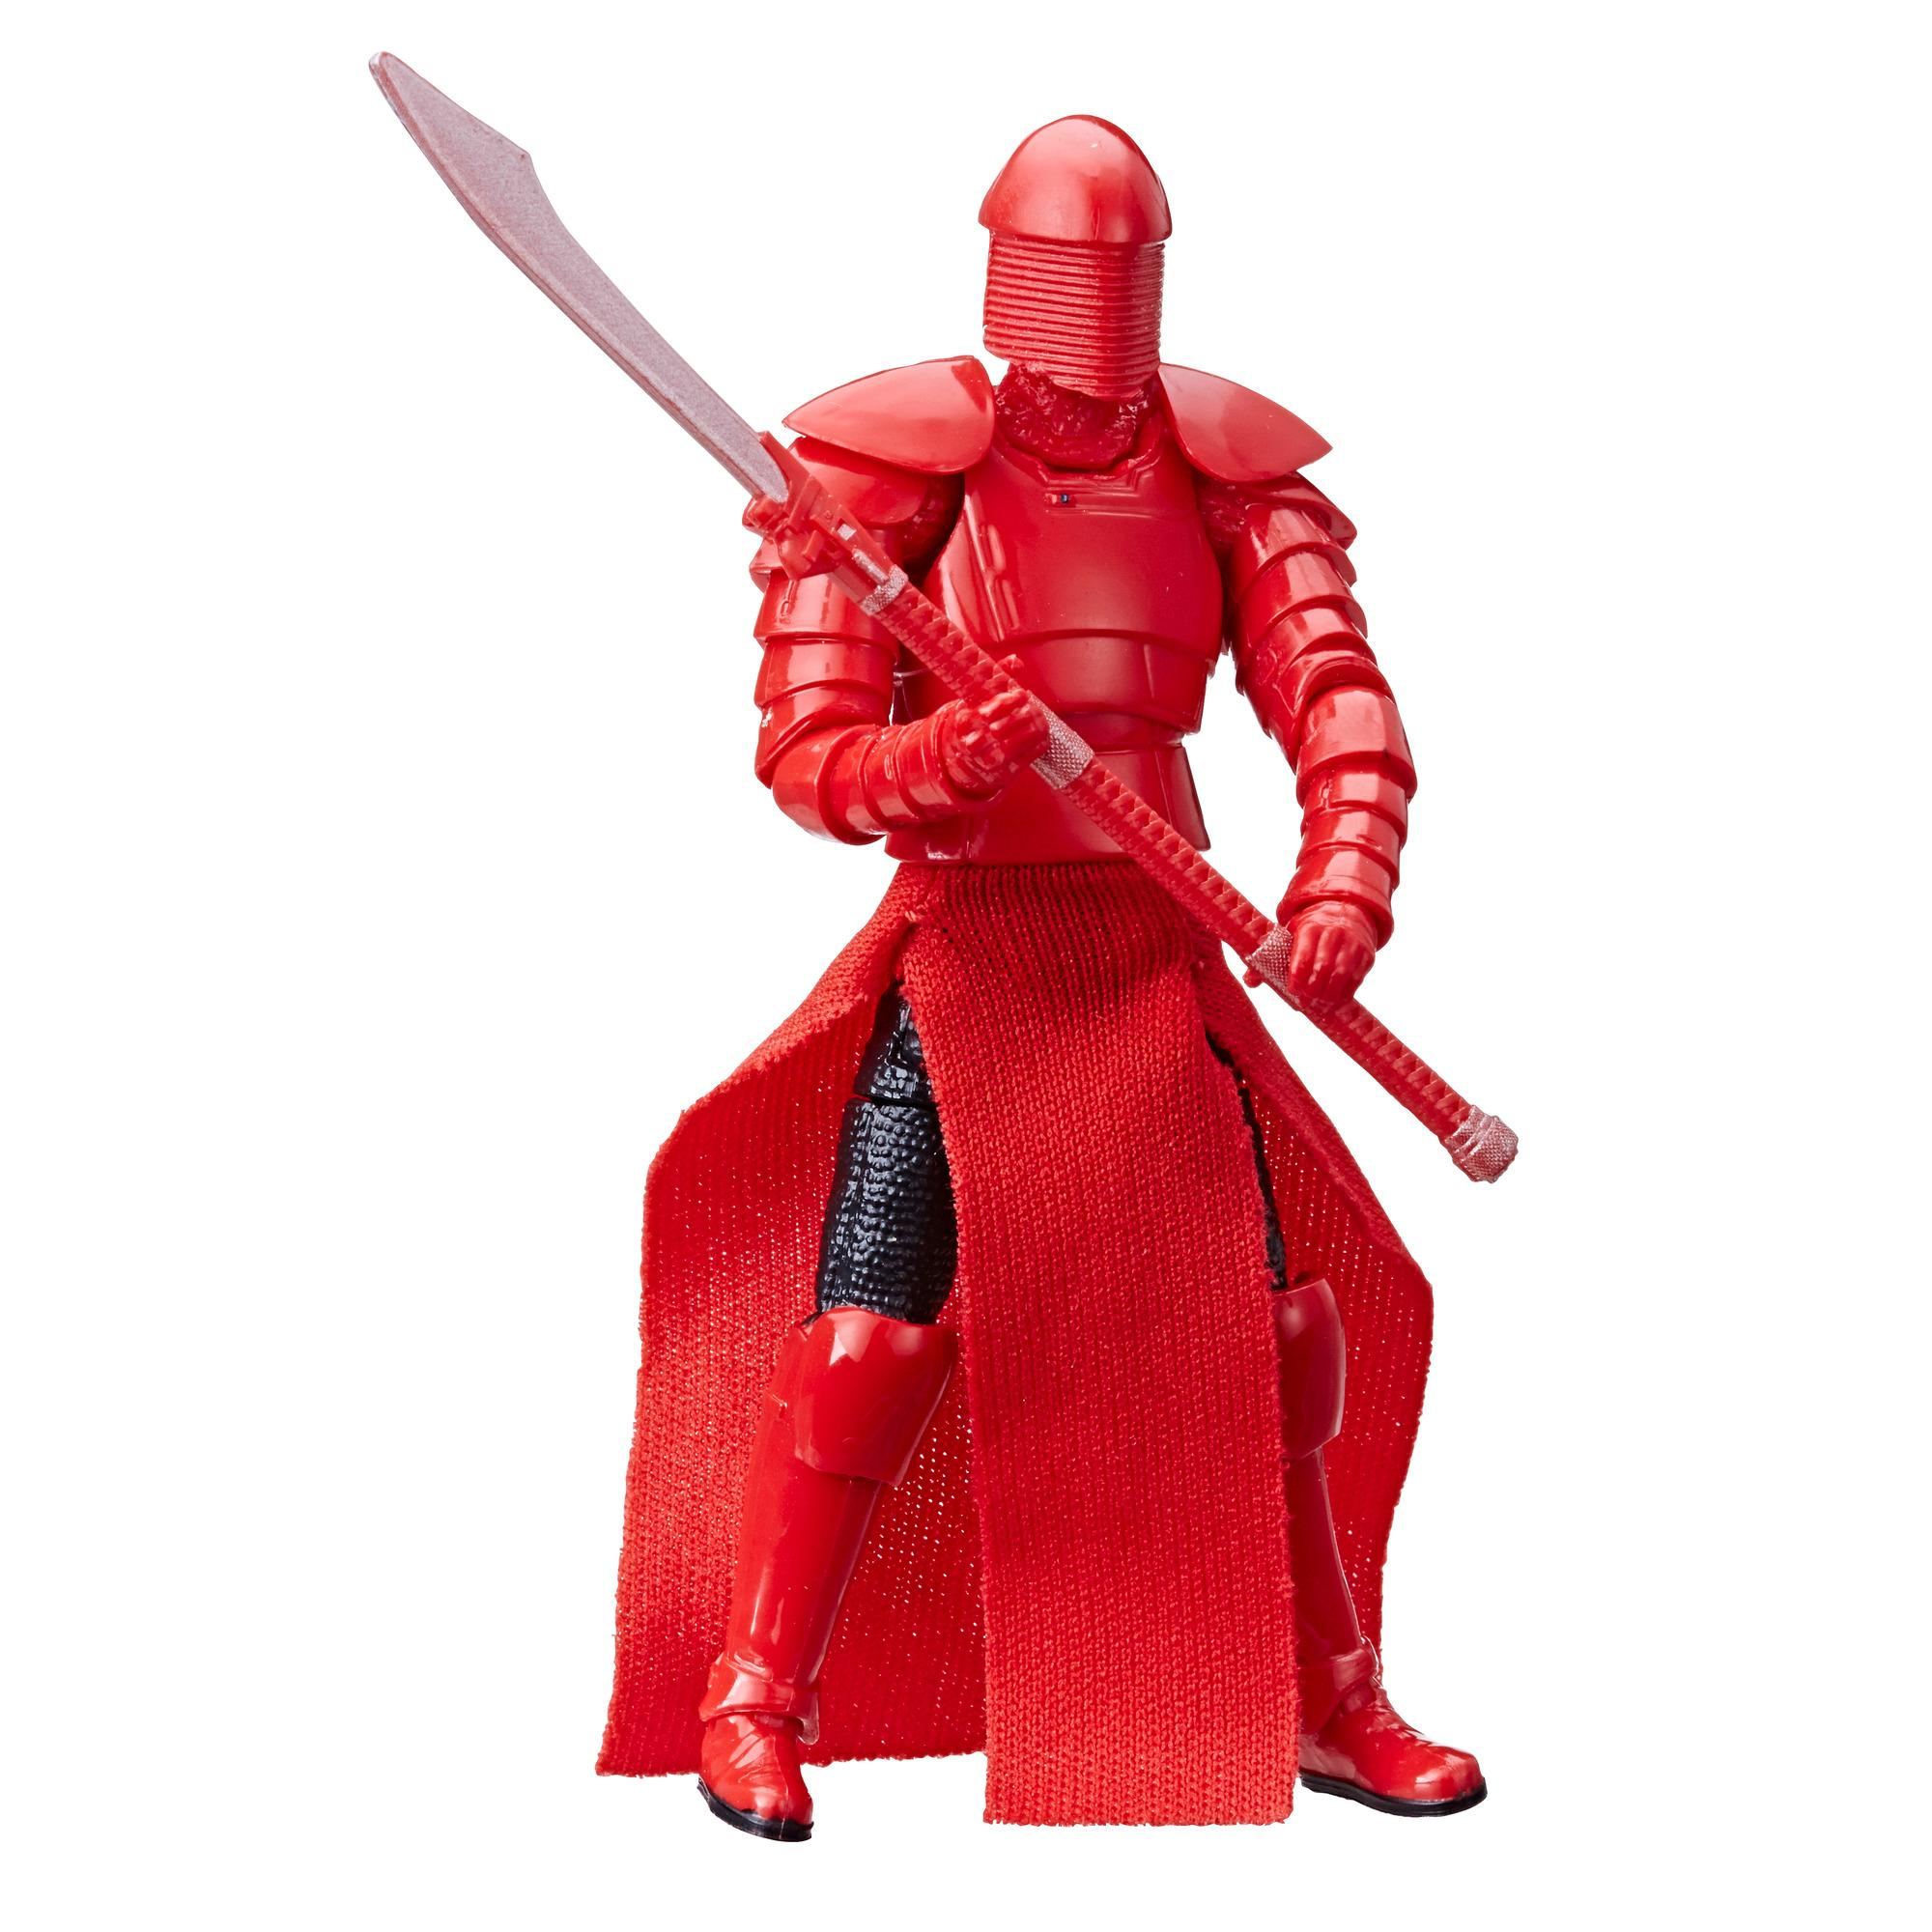 Star Wars The Vintage Collection Star Wars: The Last Jedi Elite Praetorian Guard 3.75-inch Figure